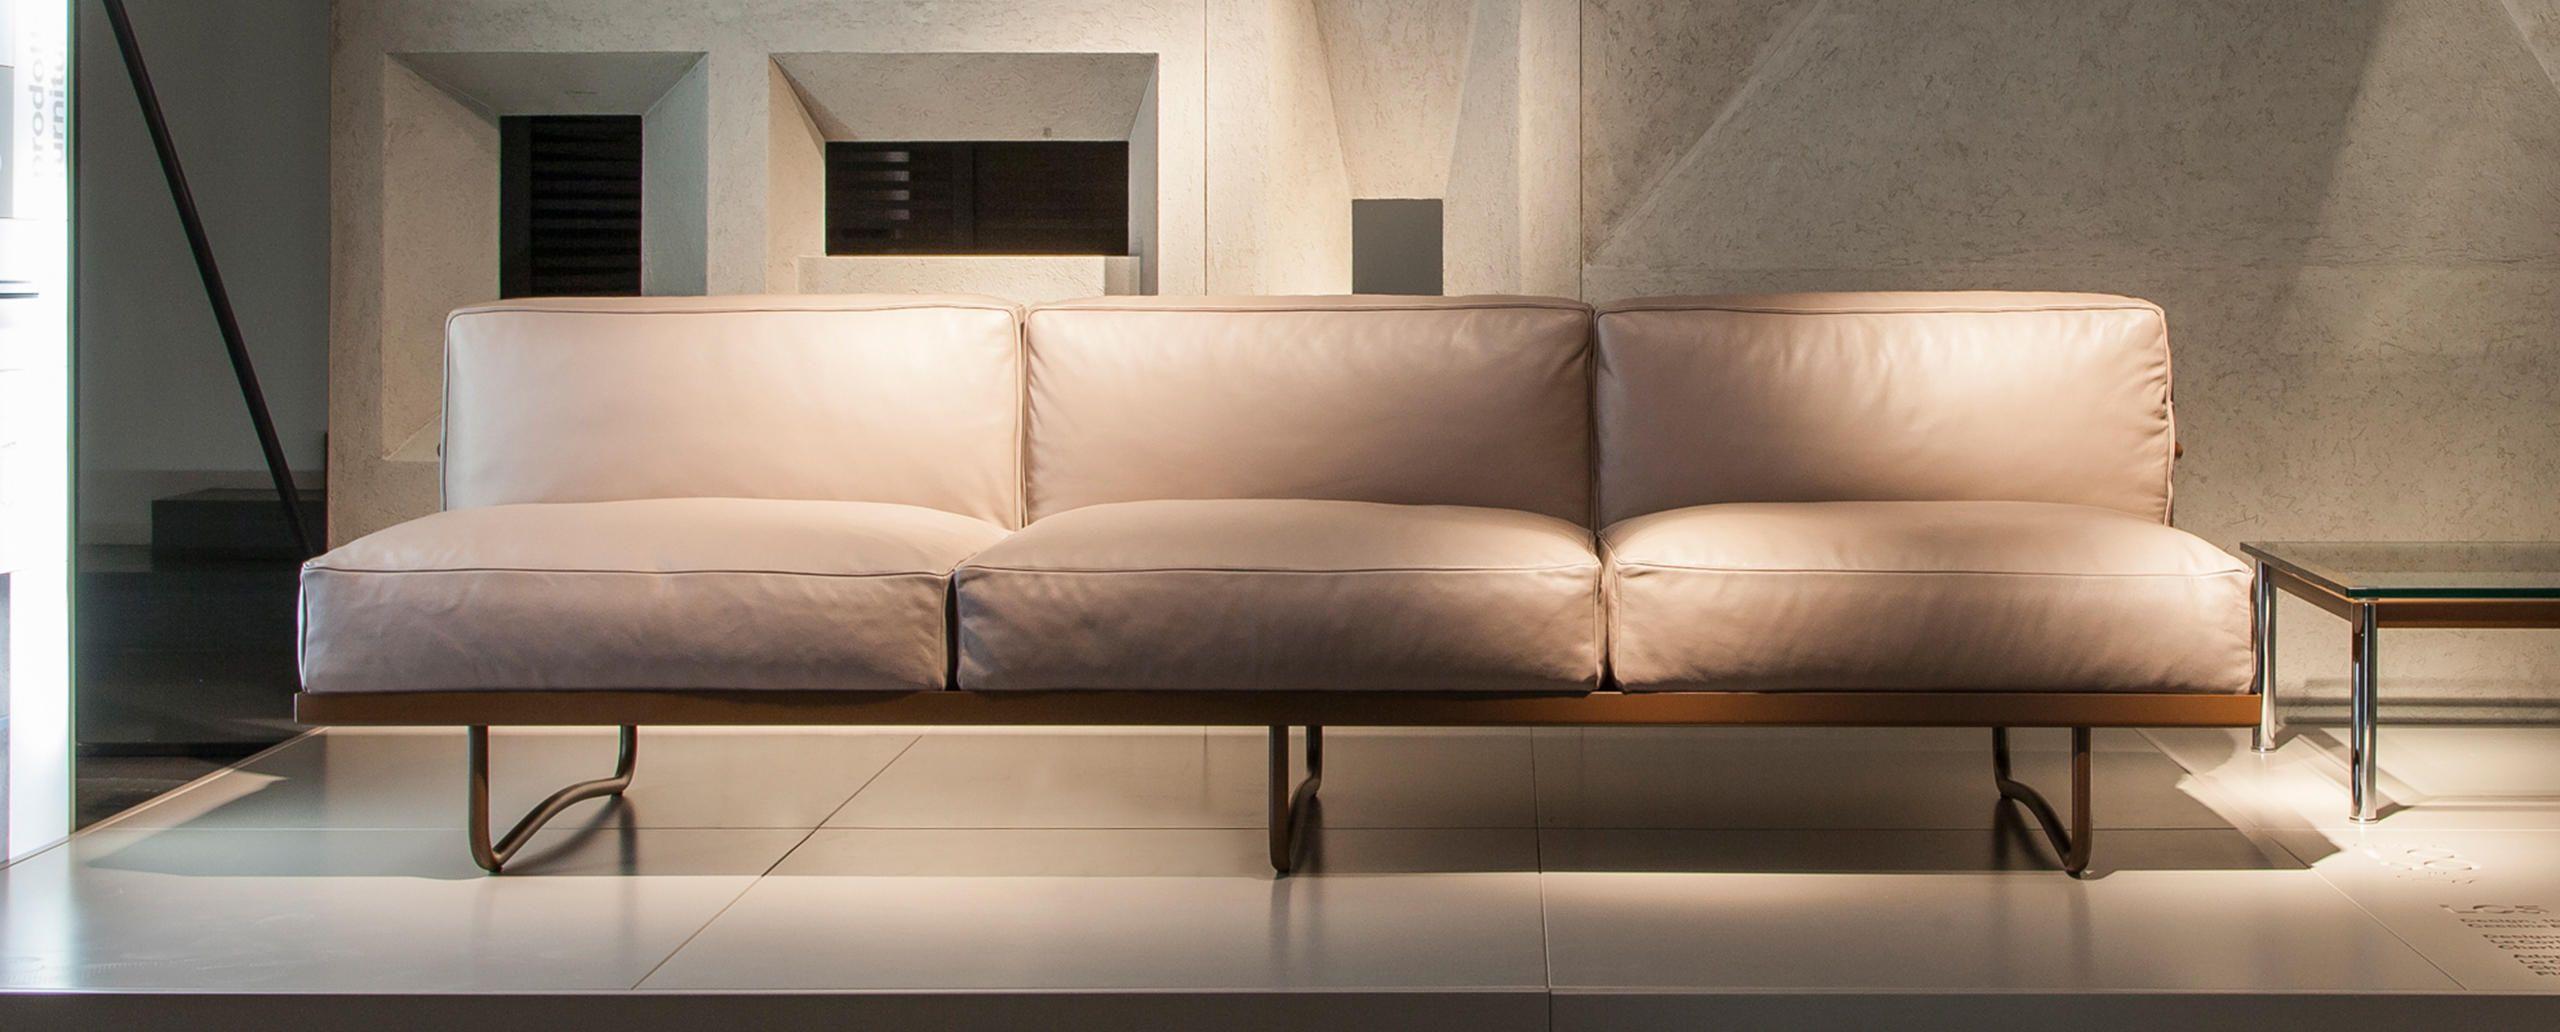 pomona sofa off white reclining lc5 le corbusier jeanneret perriand cassina